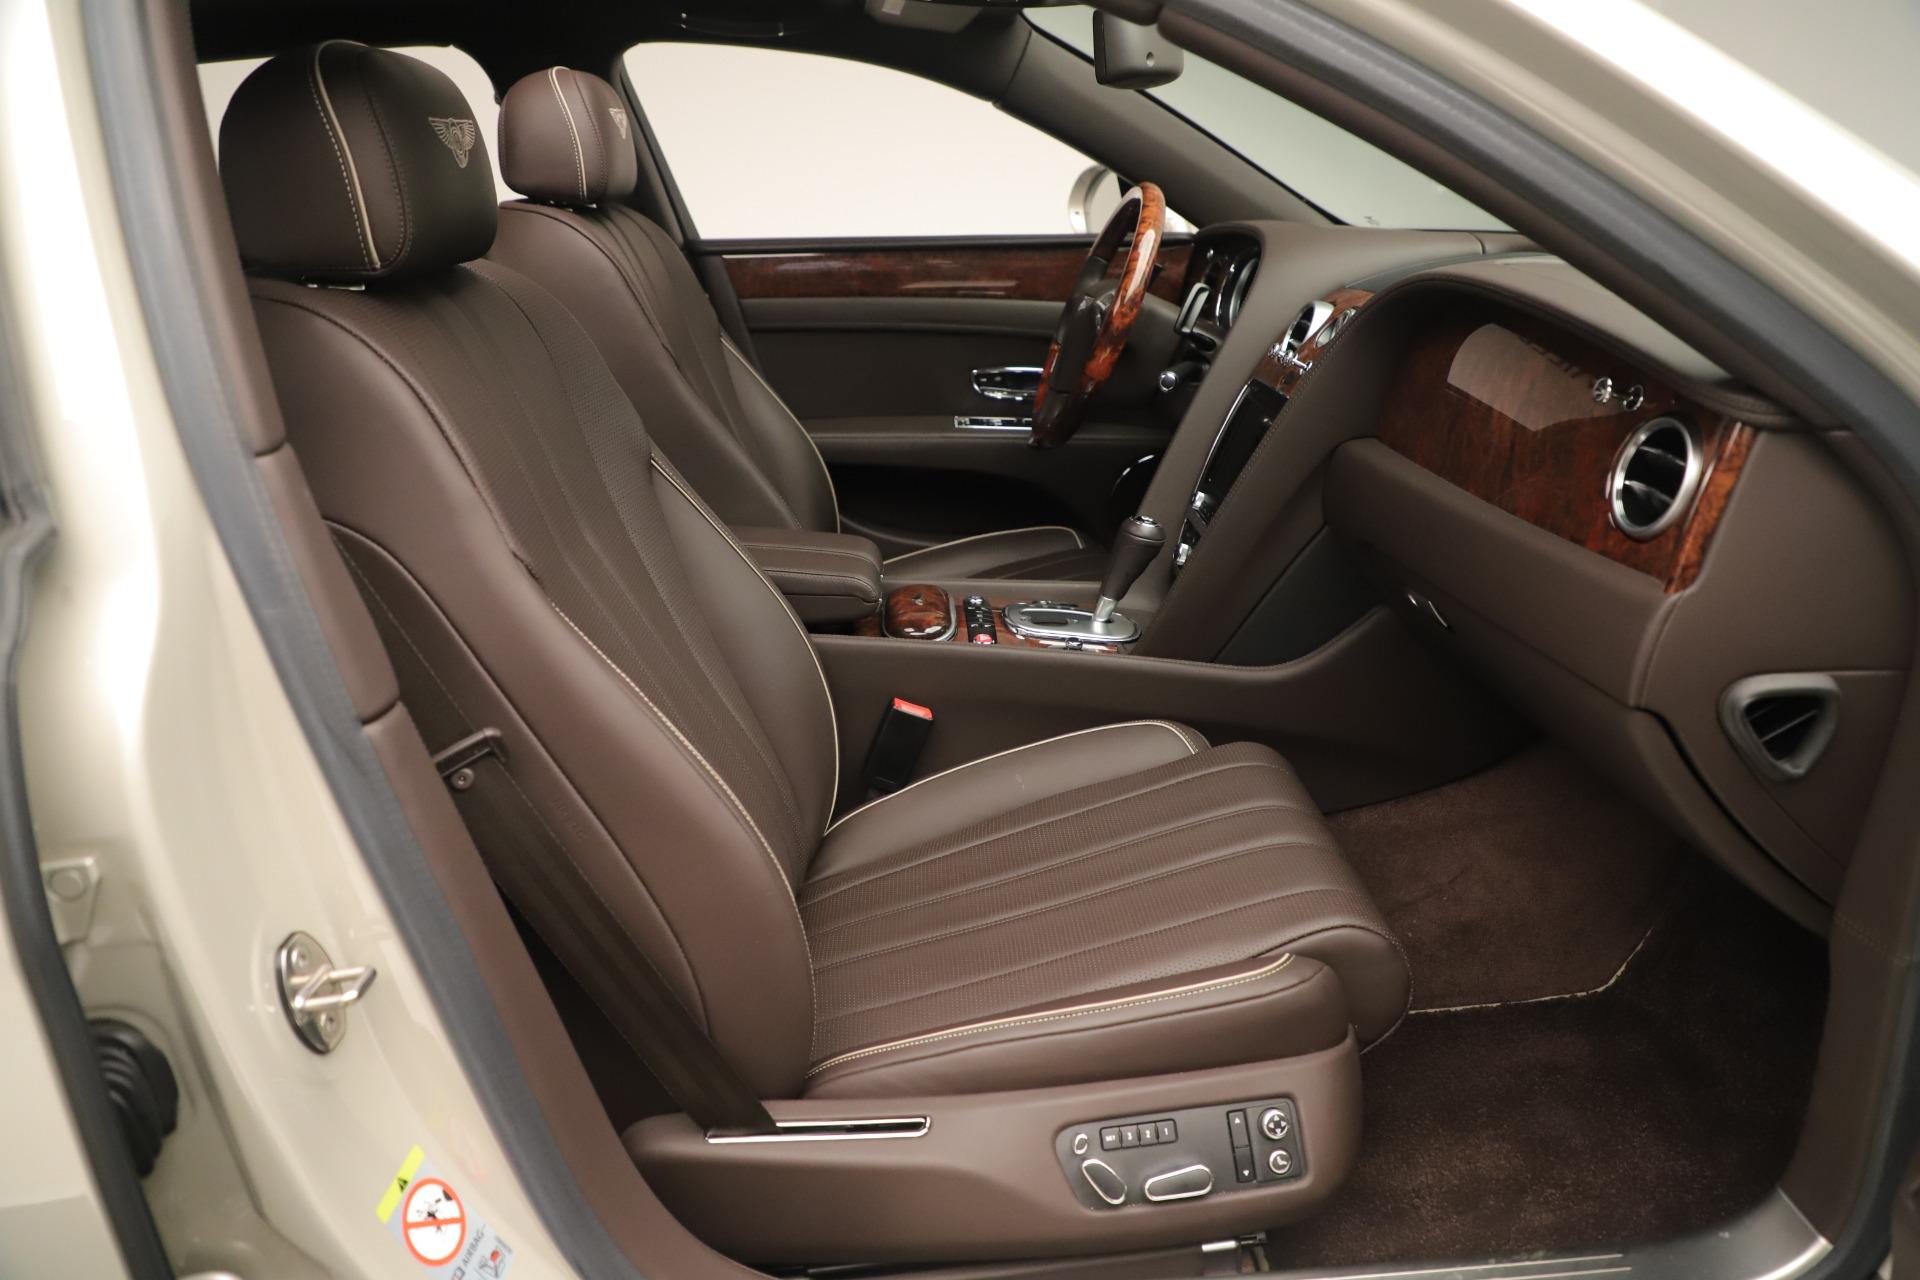 Used 2015 Bentley Flying Spur V8 For Sale In Westport, CT 3444_p25